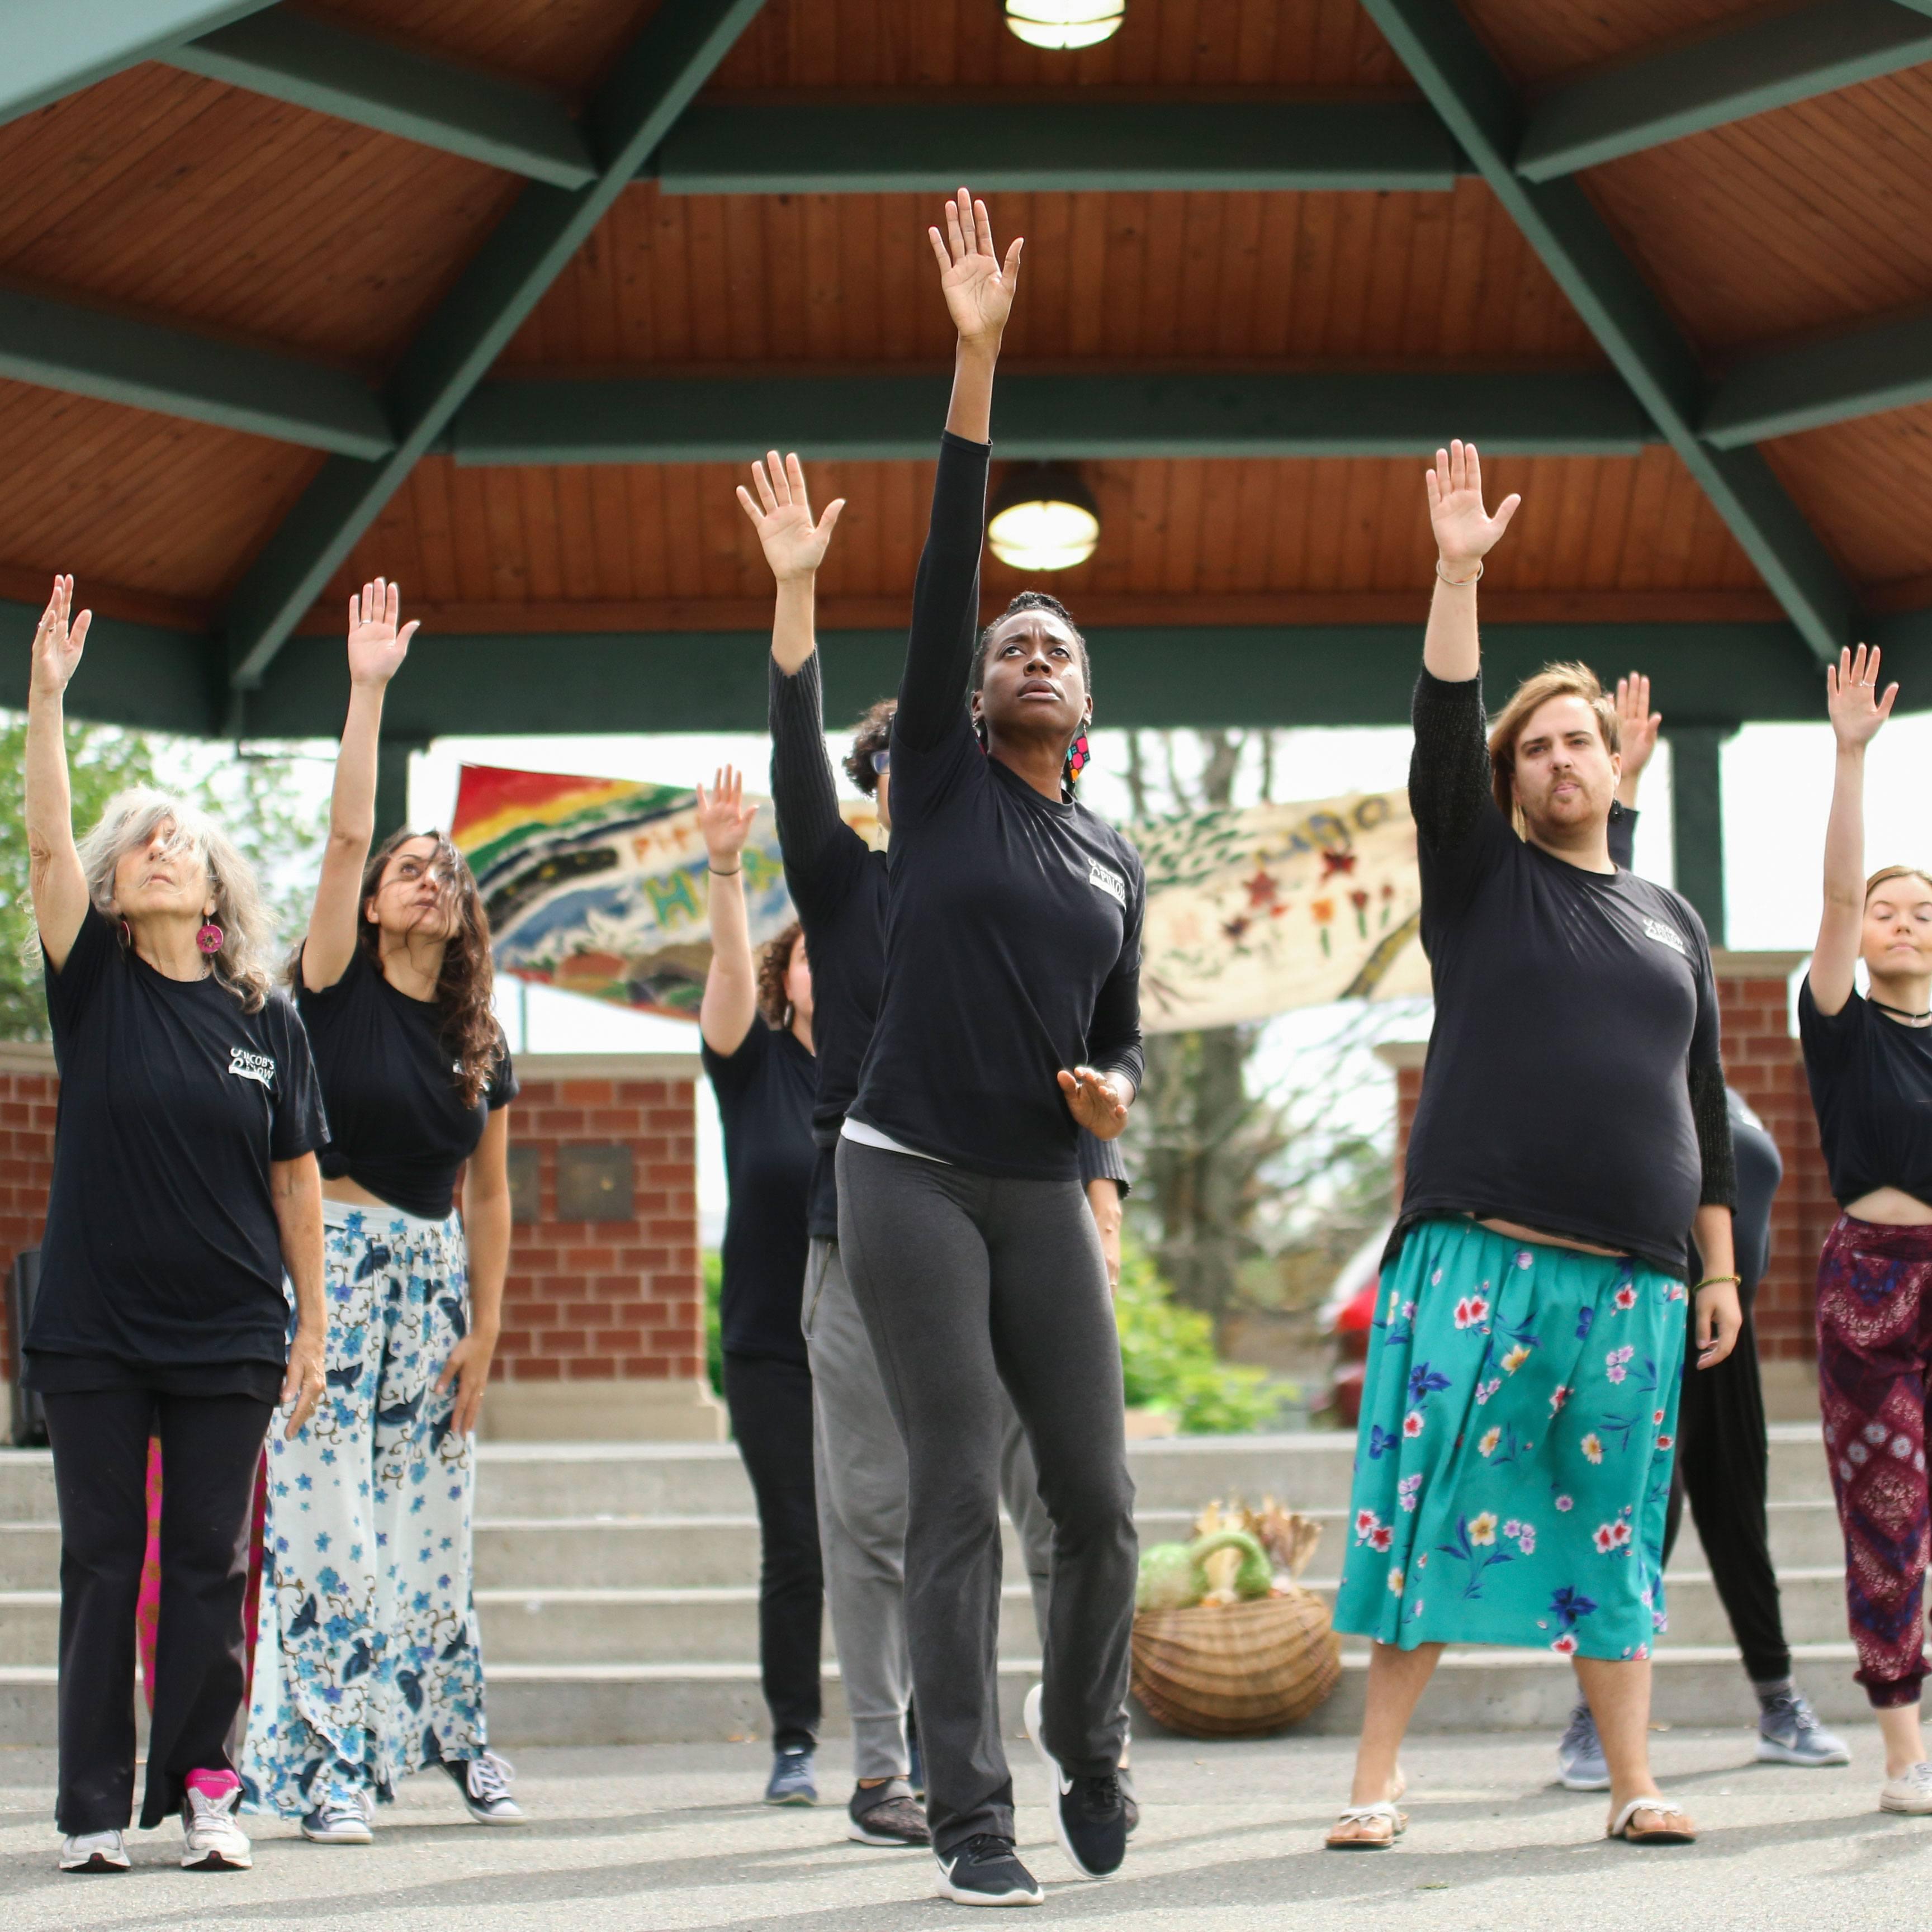 <em>Pittsfield Moves!</em> Community dancers performing at Harvest of Hope; photo Noor Eemaan